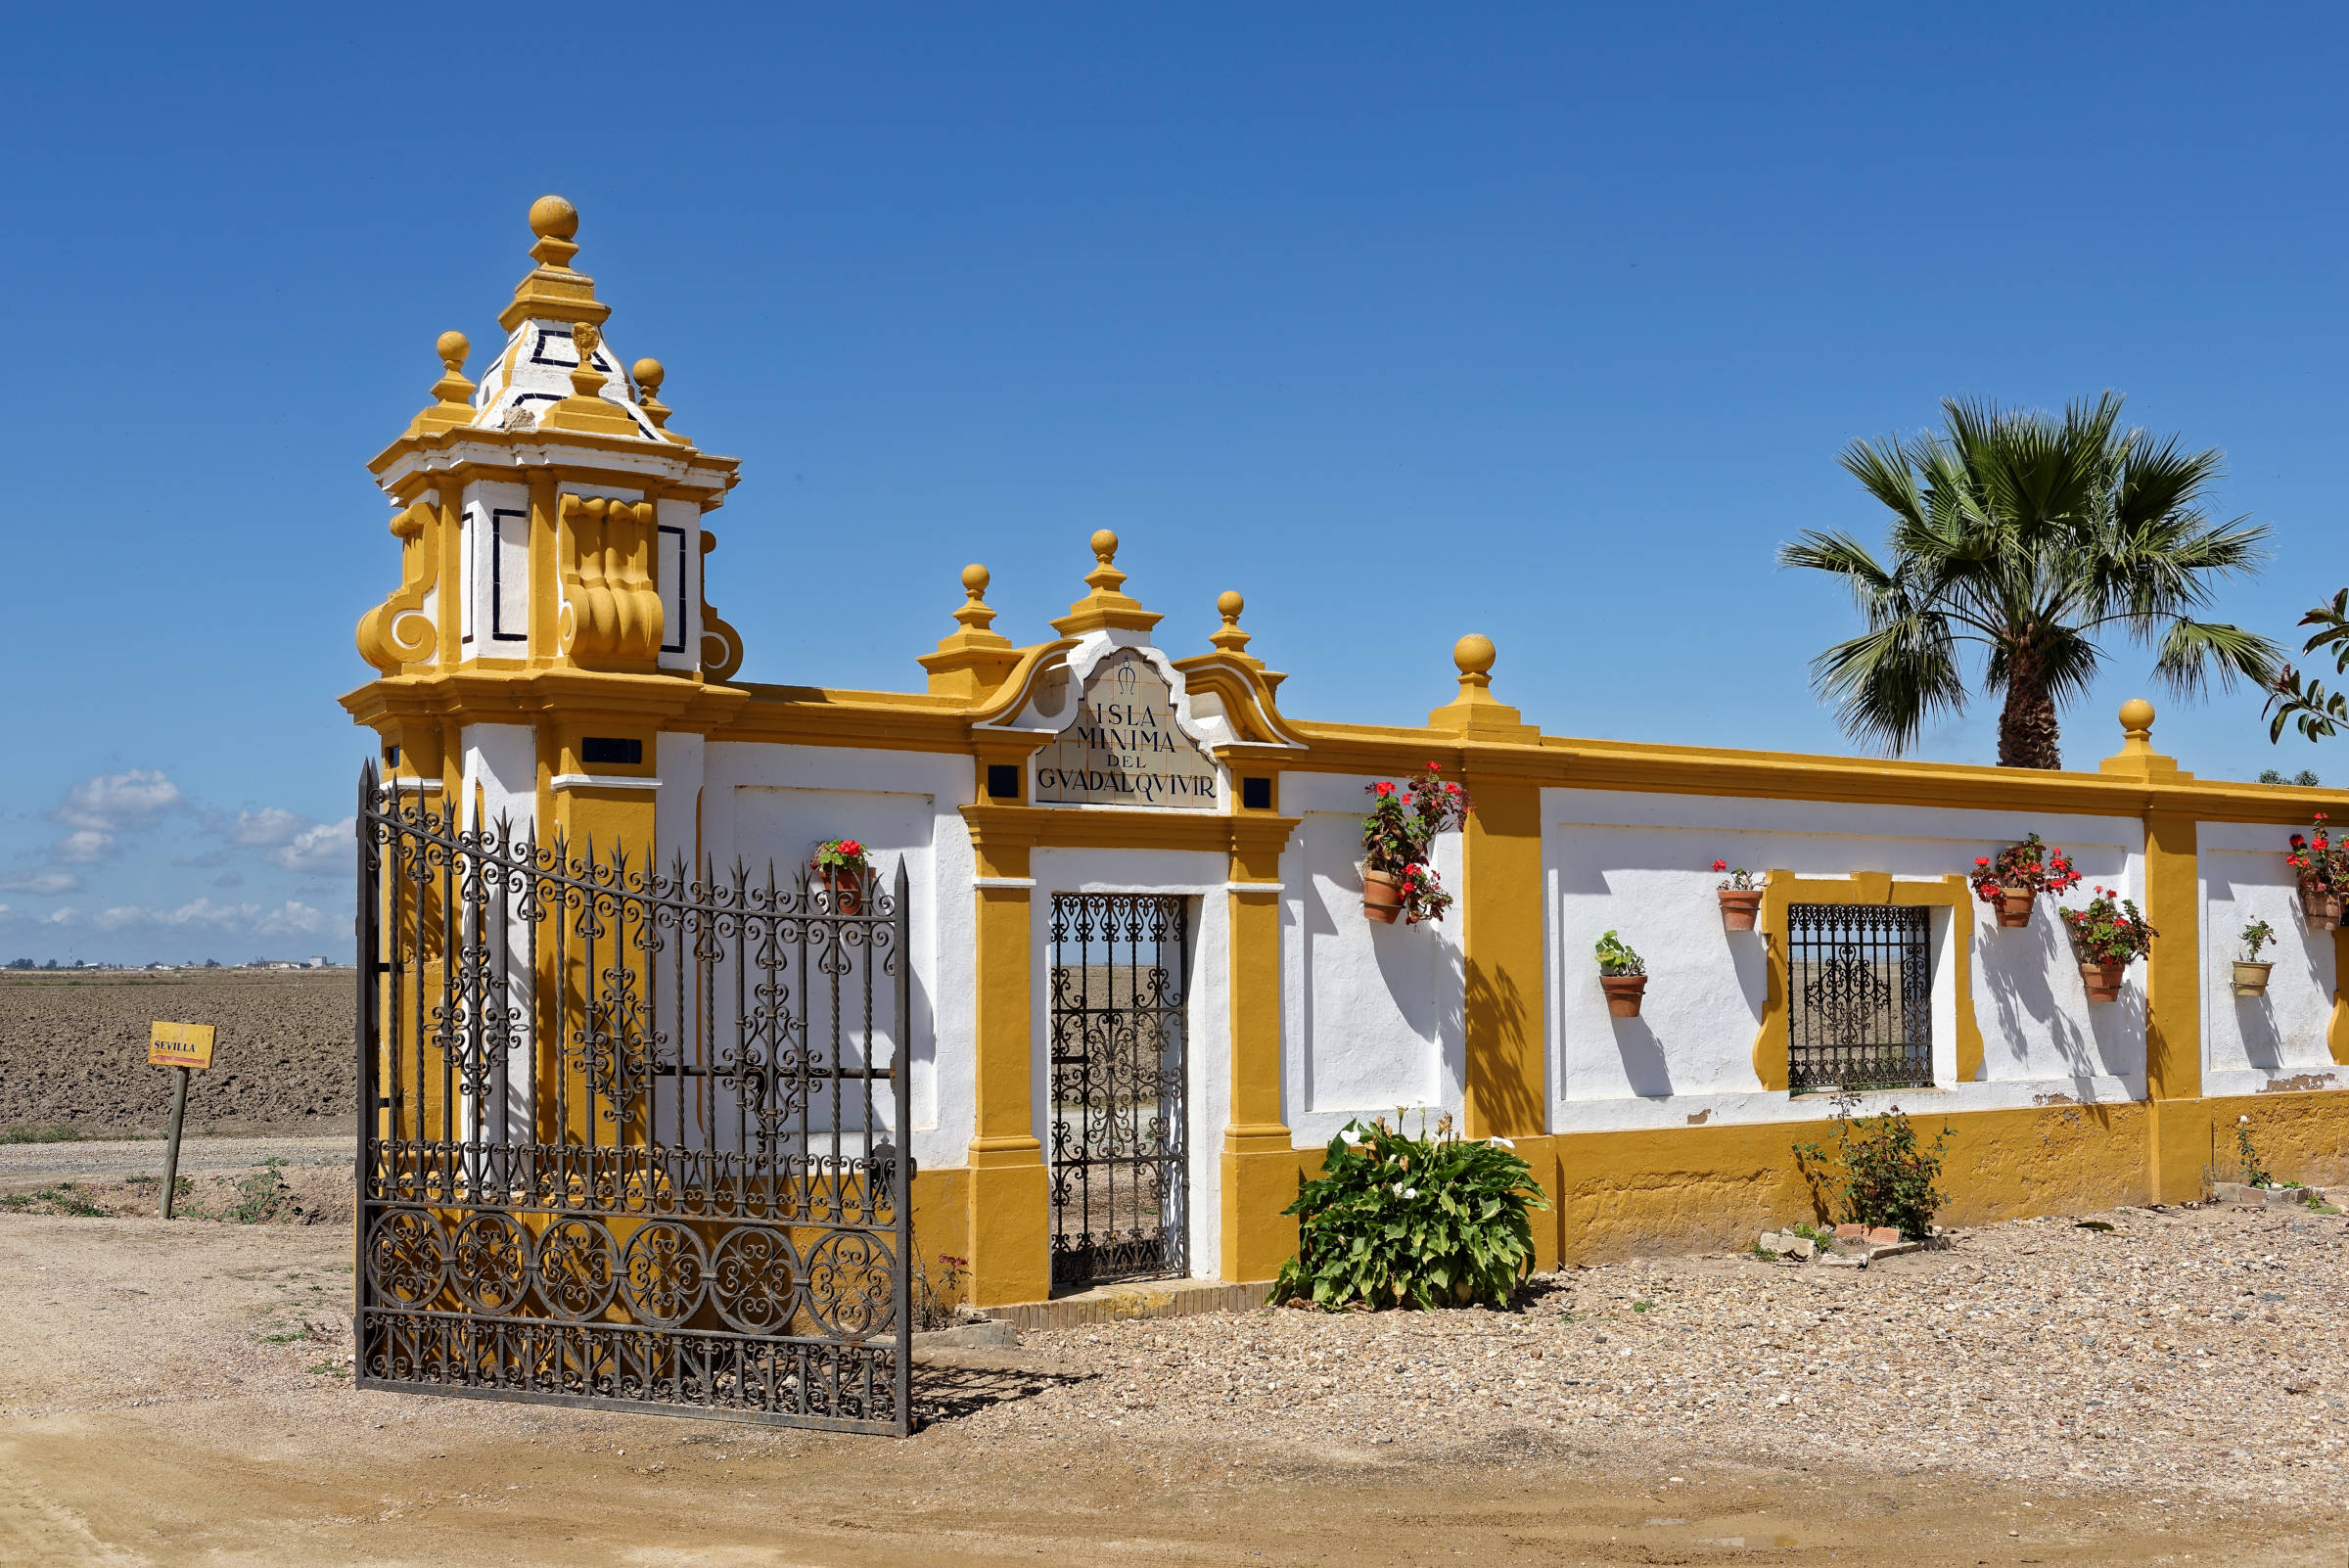 160414-Isla minima - Escobar (Andalousie) (18)